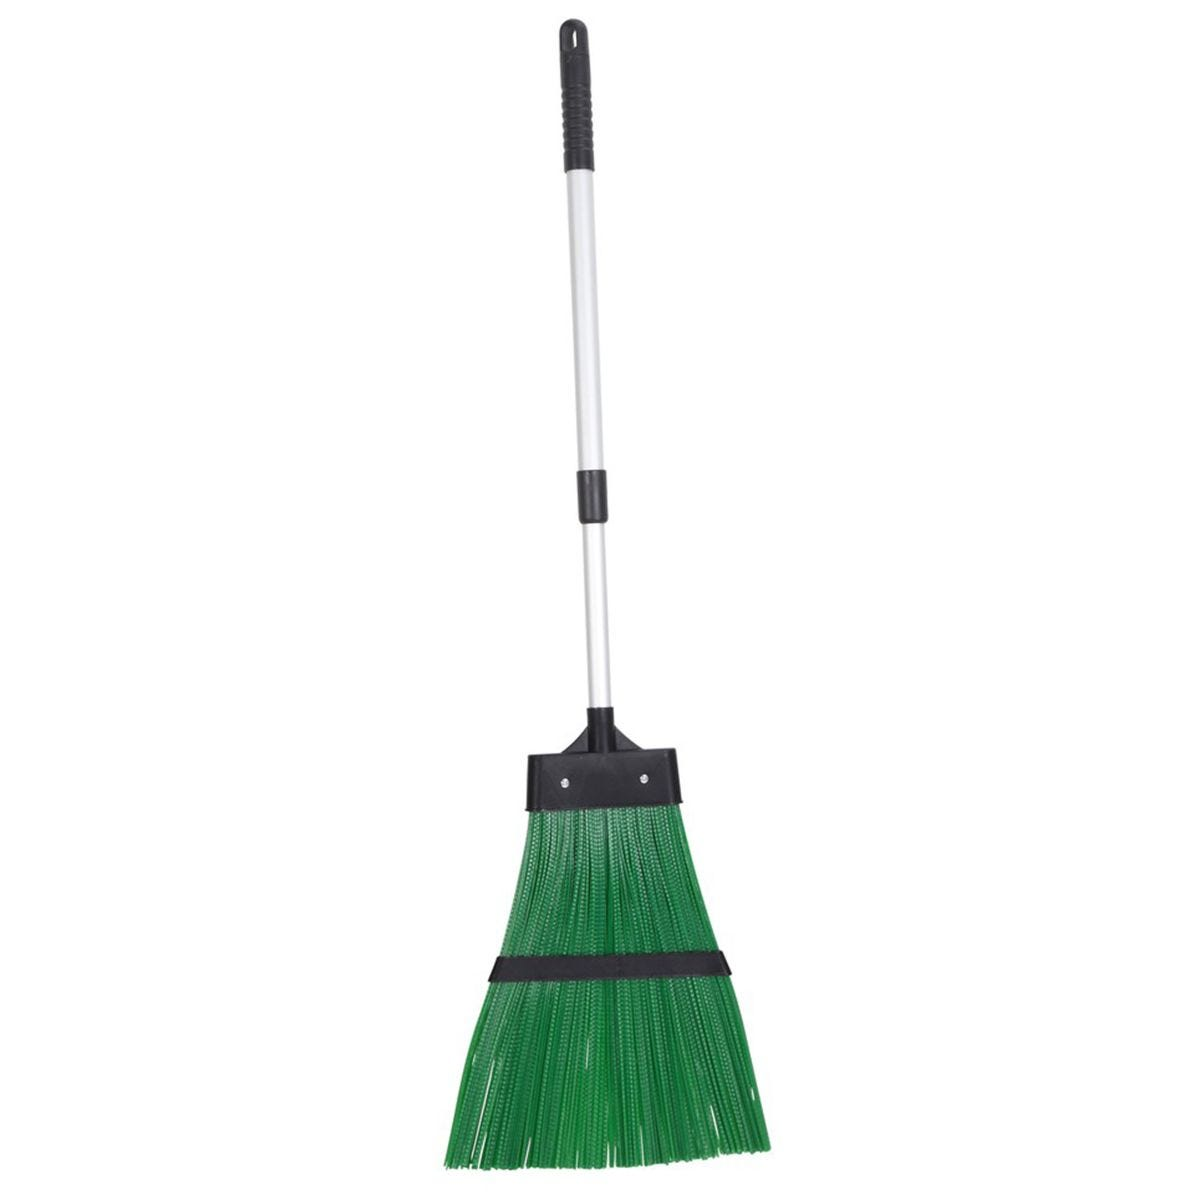 JVL Outdoor Garden Hard Bristled Broom Brush Rake with Extendable Handle Green